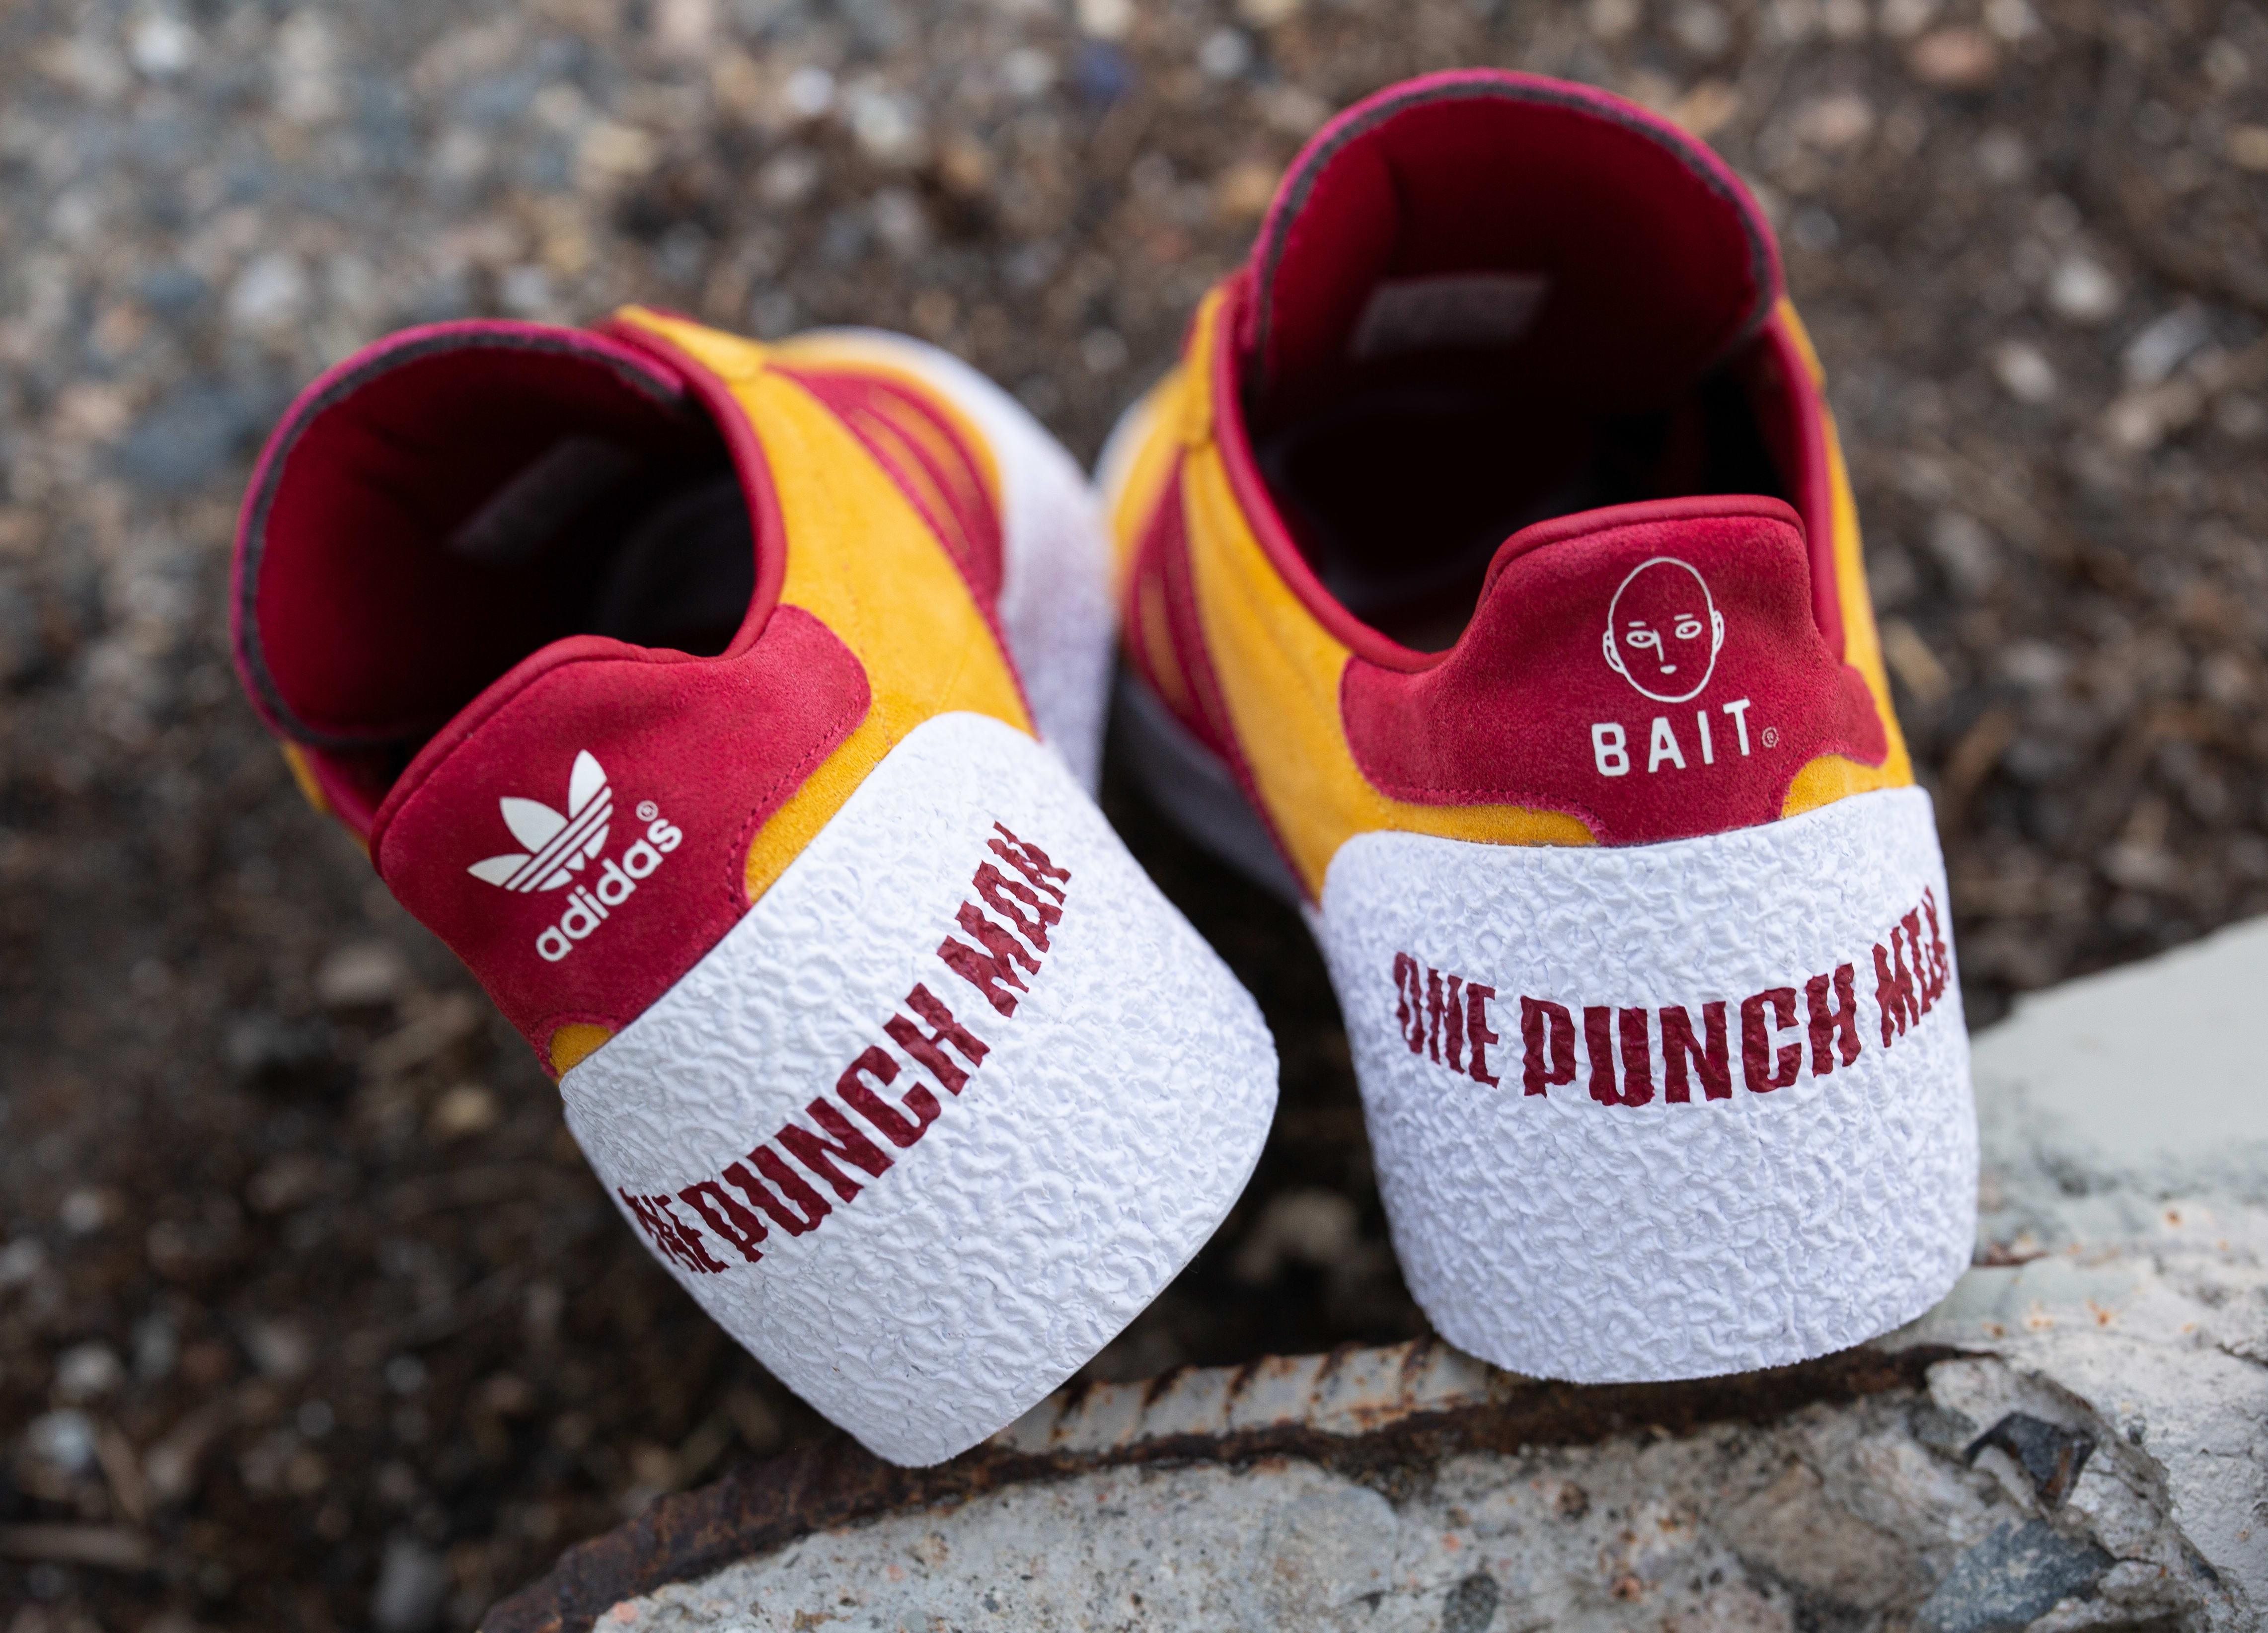 Bait x One Punch Man x Adidas Montreal Heel